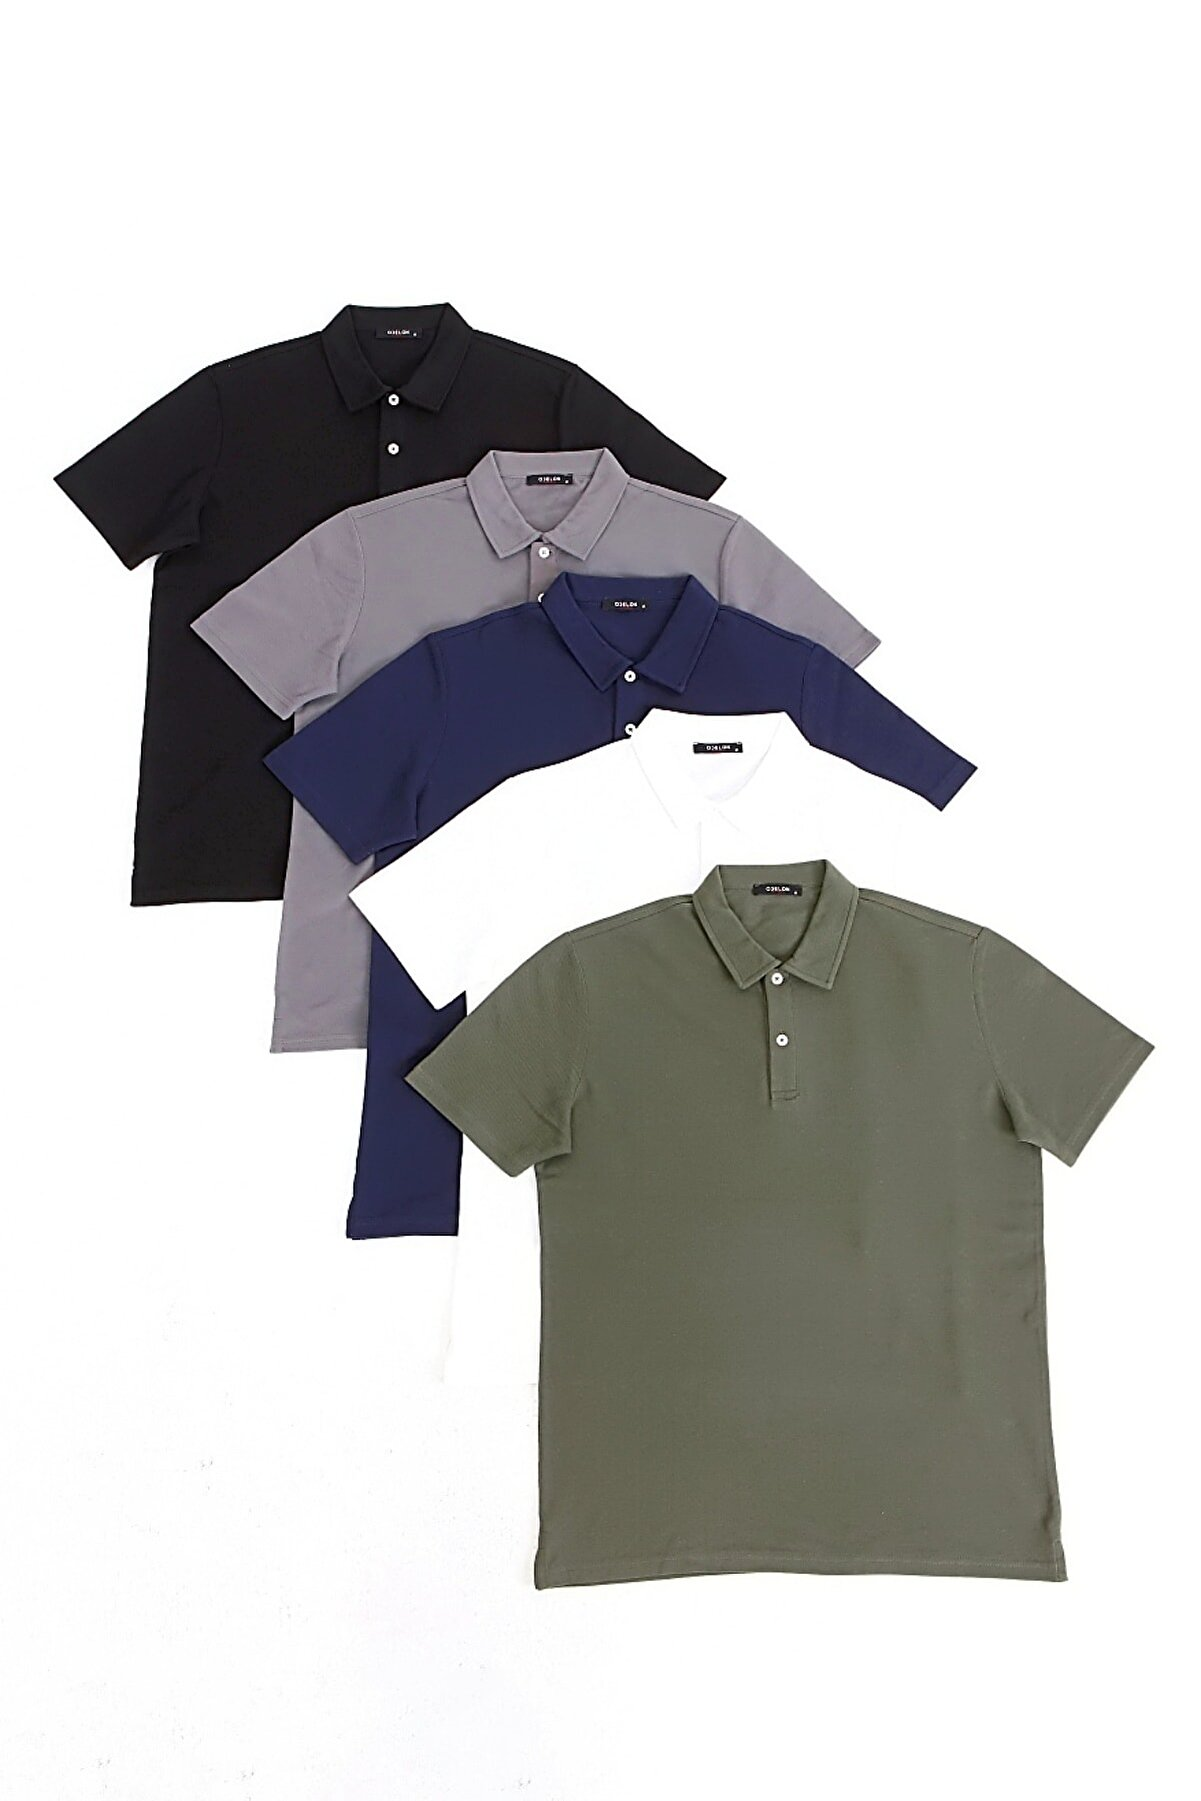 odelon Erkek Regular Fit Rahat Kalıp Polo Yaka 5li Tişört Paketi Çok Renkli